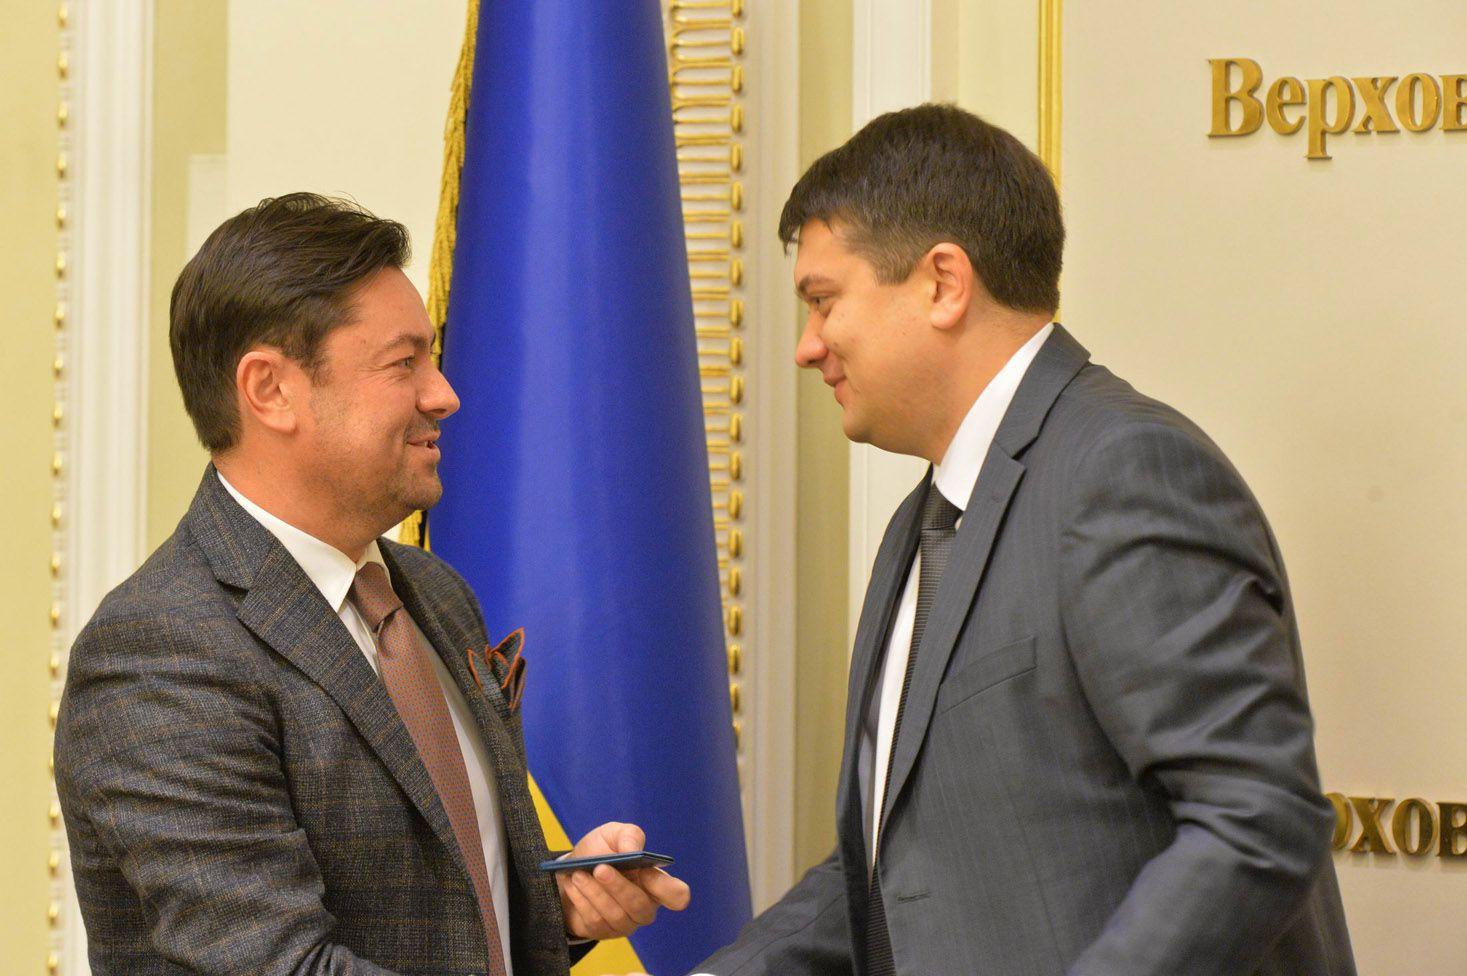 В'ячеслава Штучний - керівник апарату Верховної Ради України